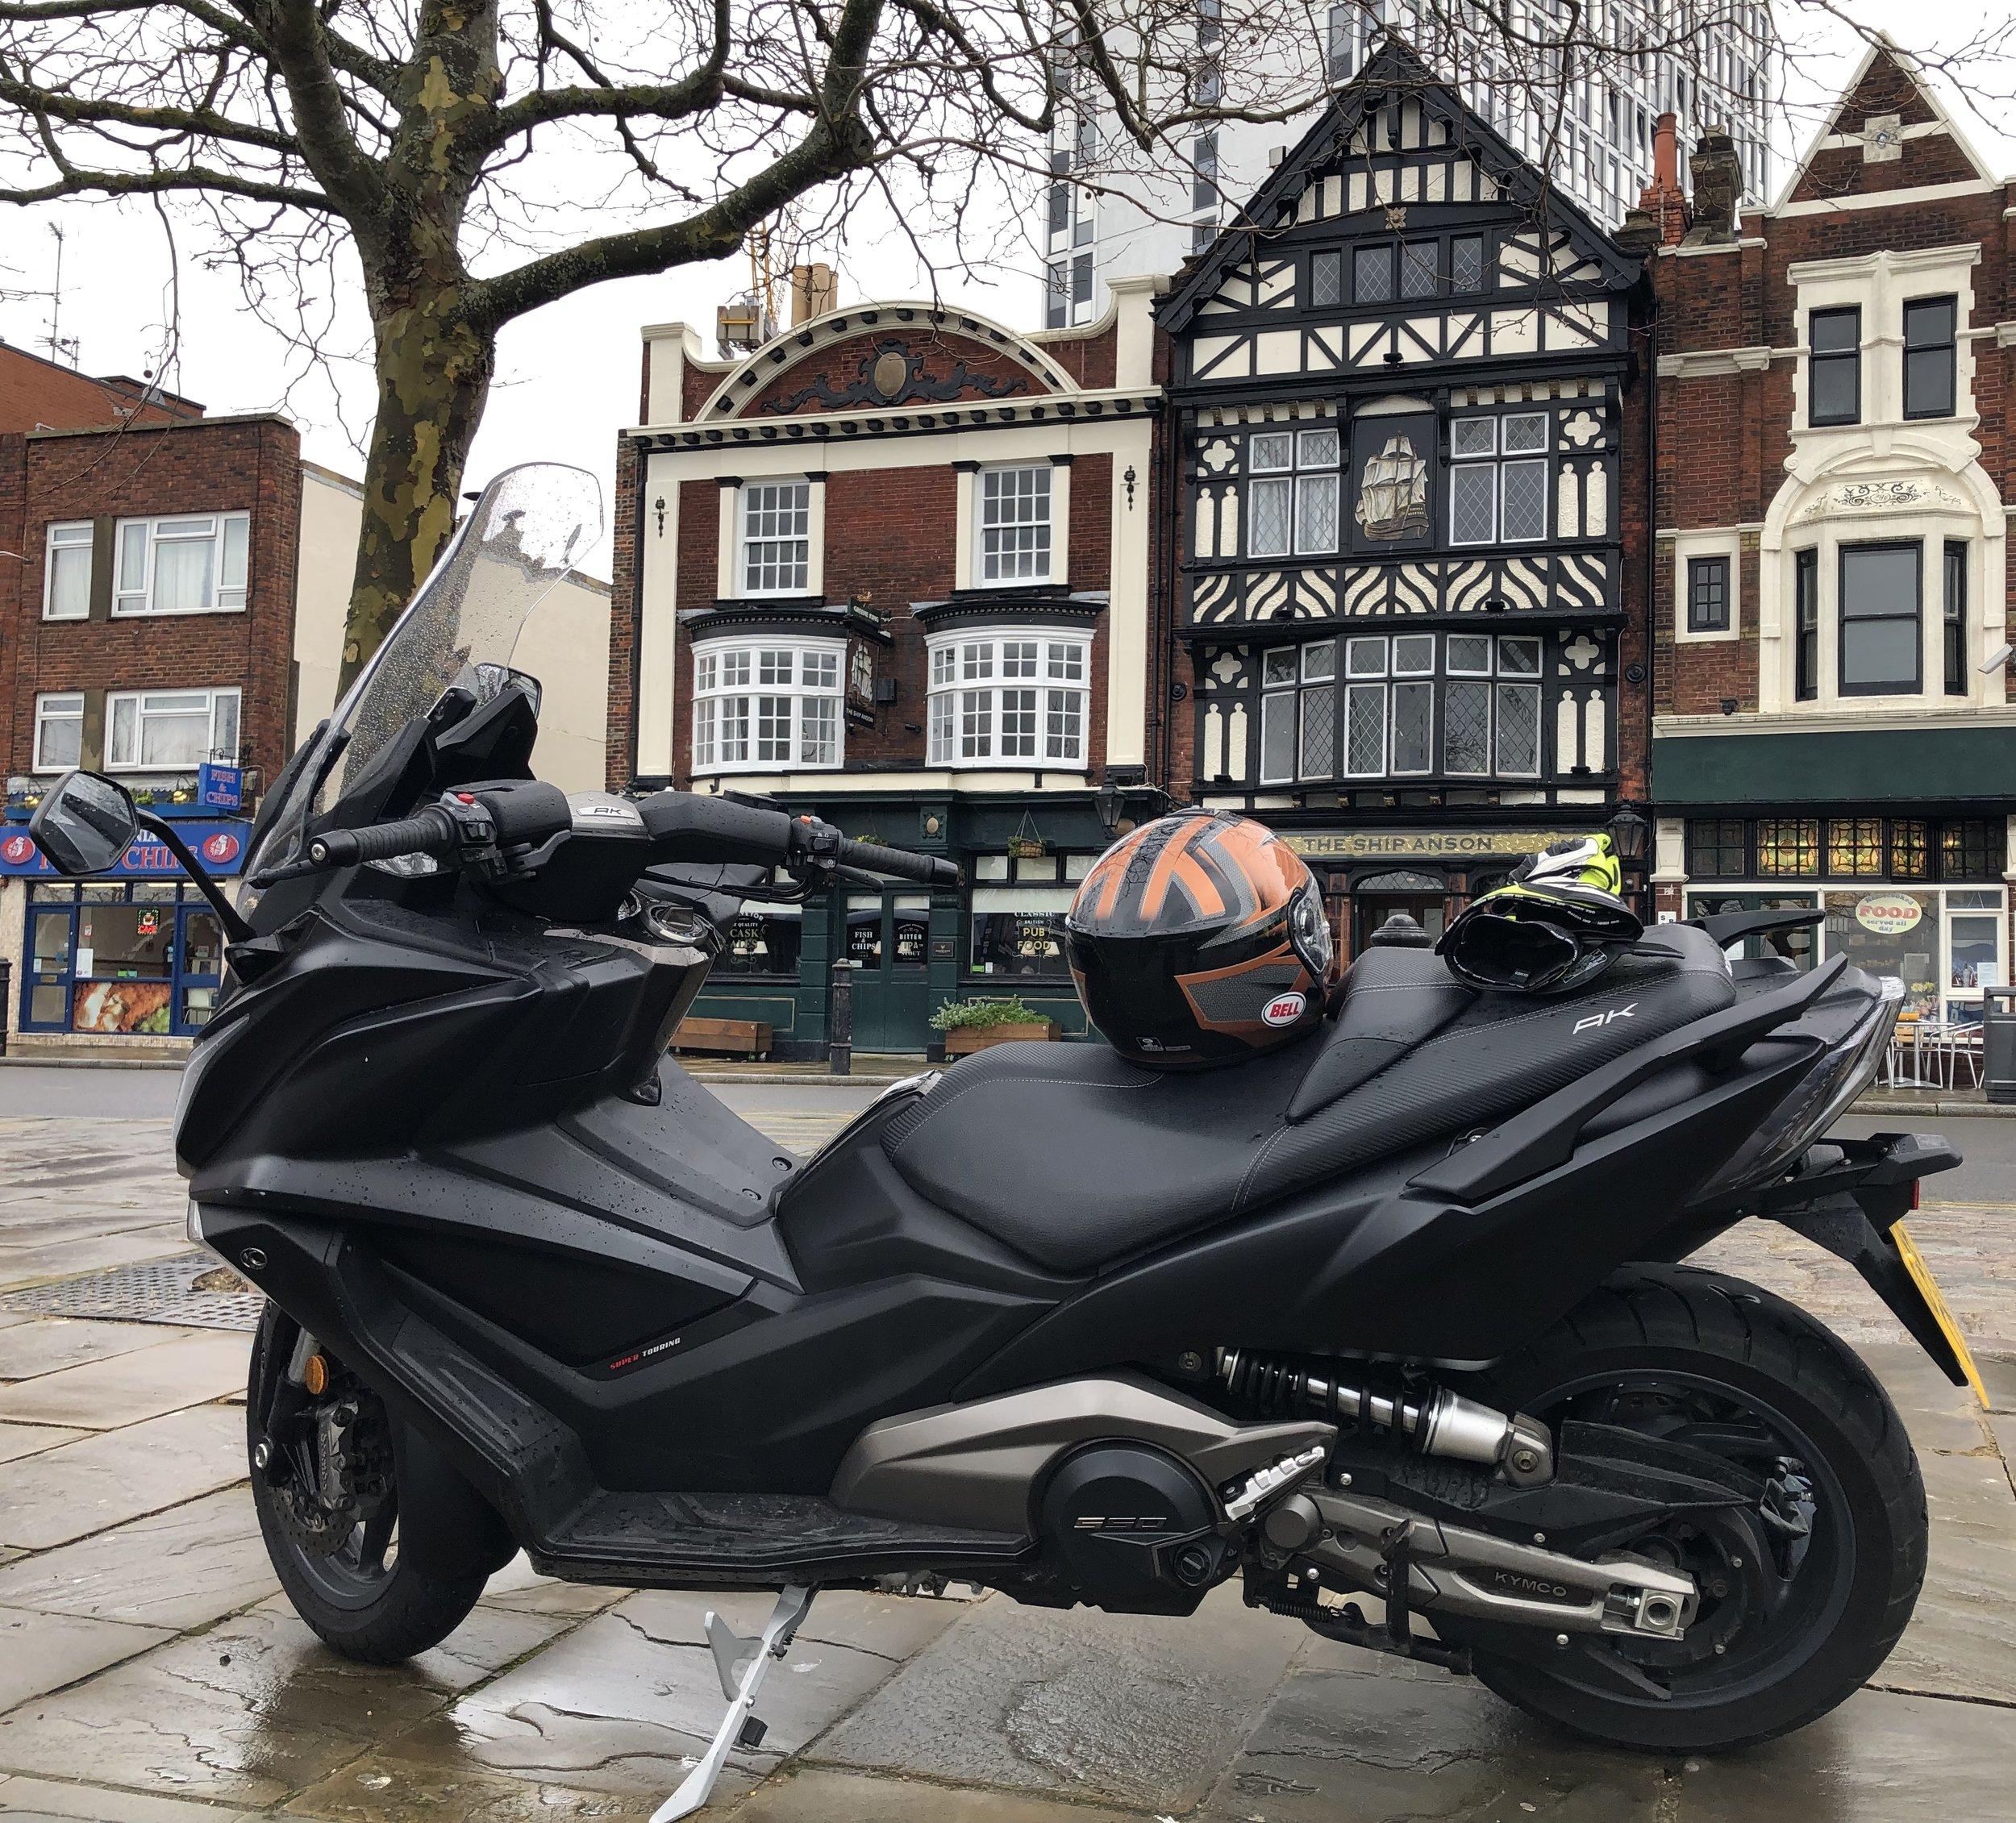 A great city bike.